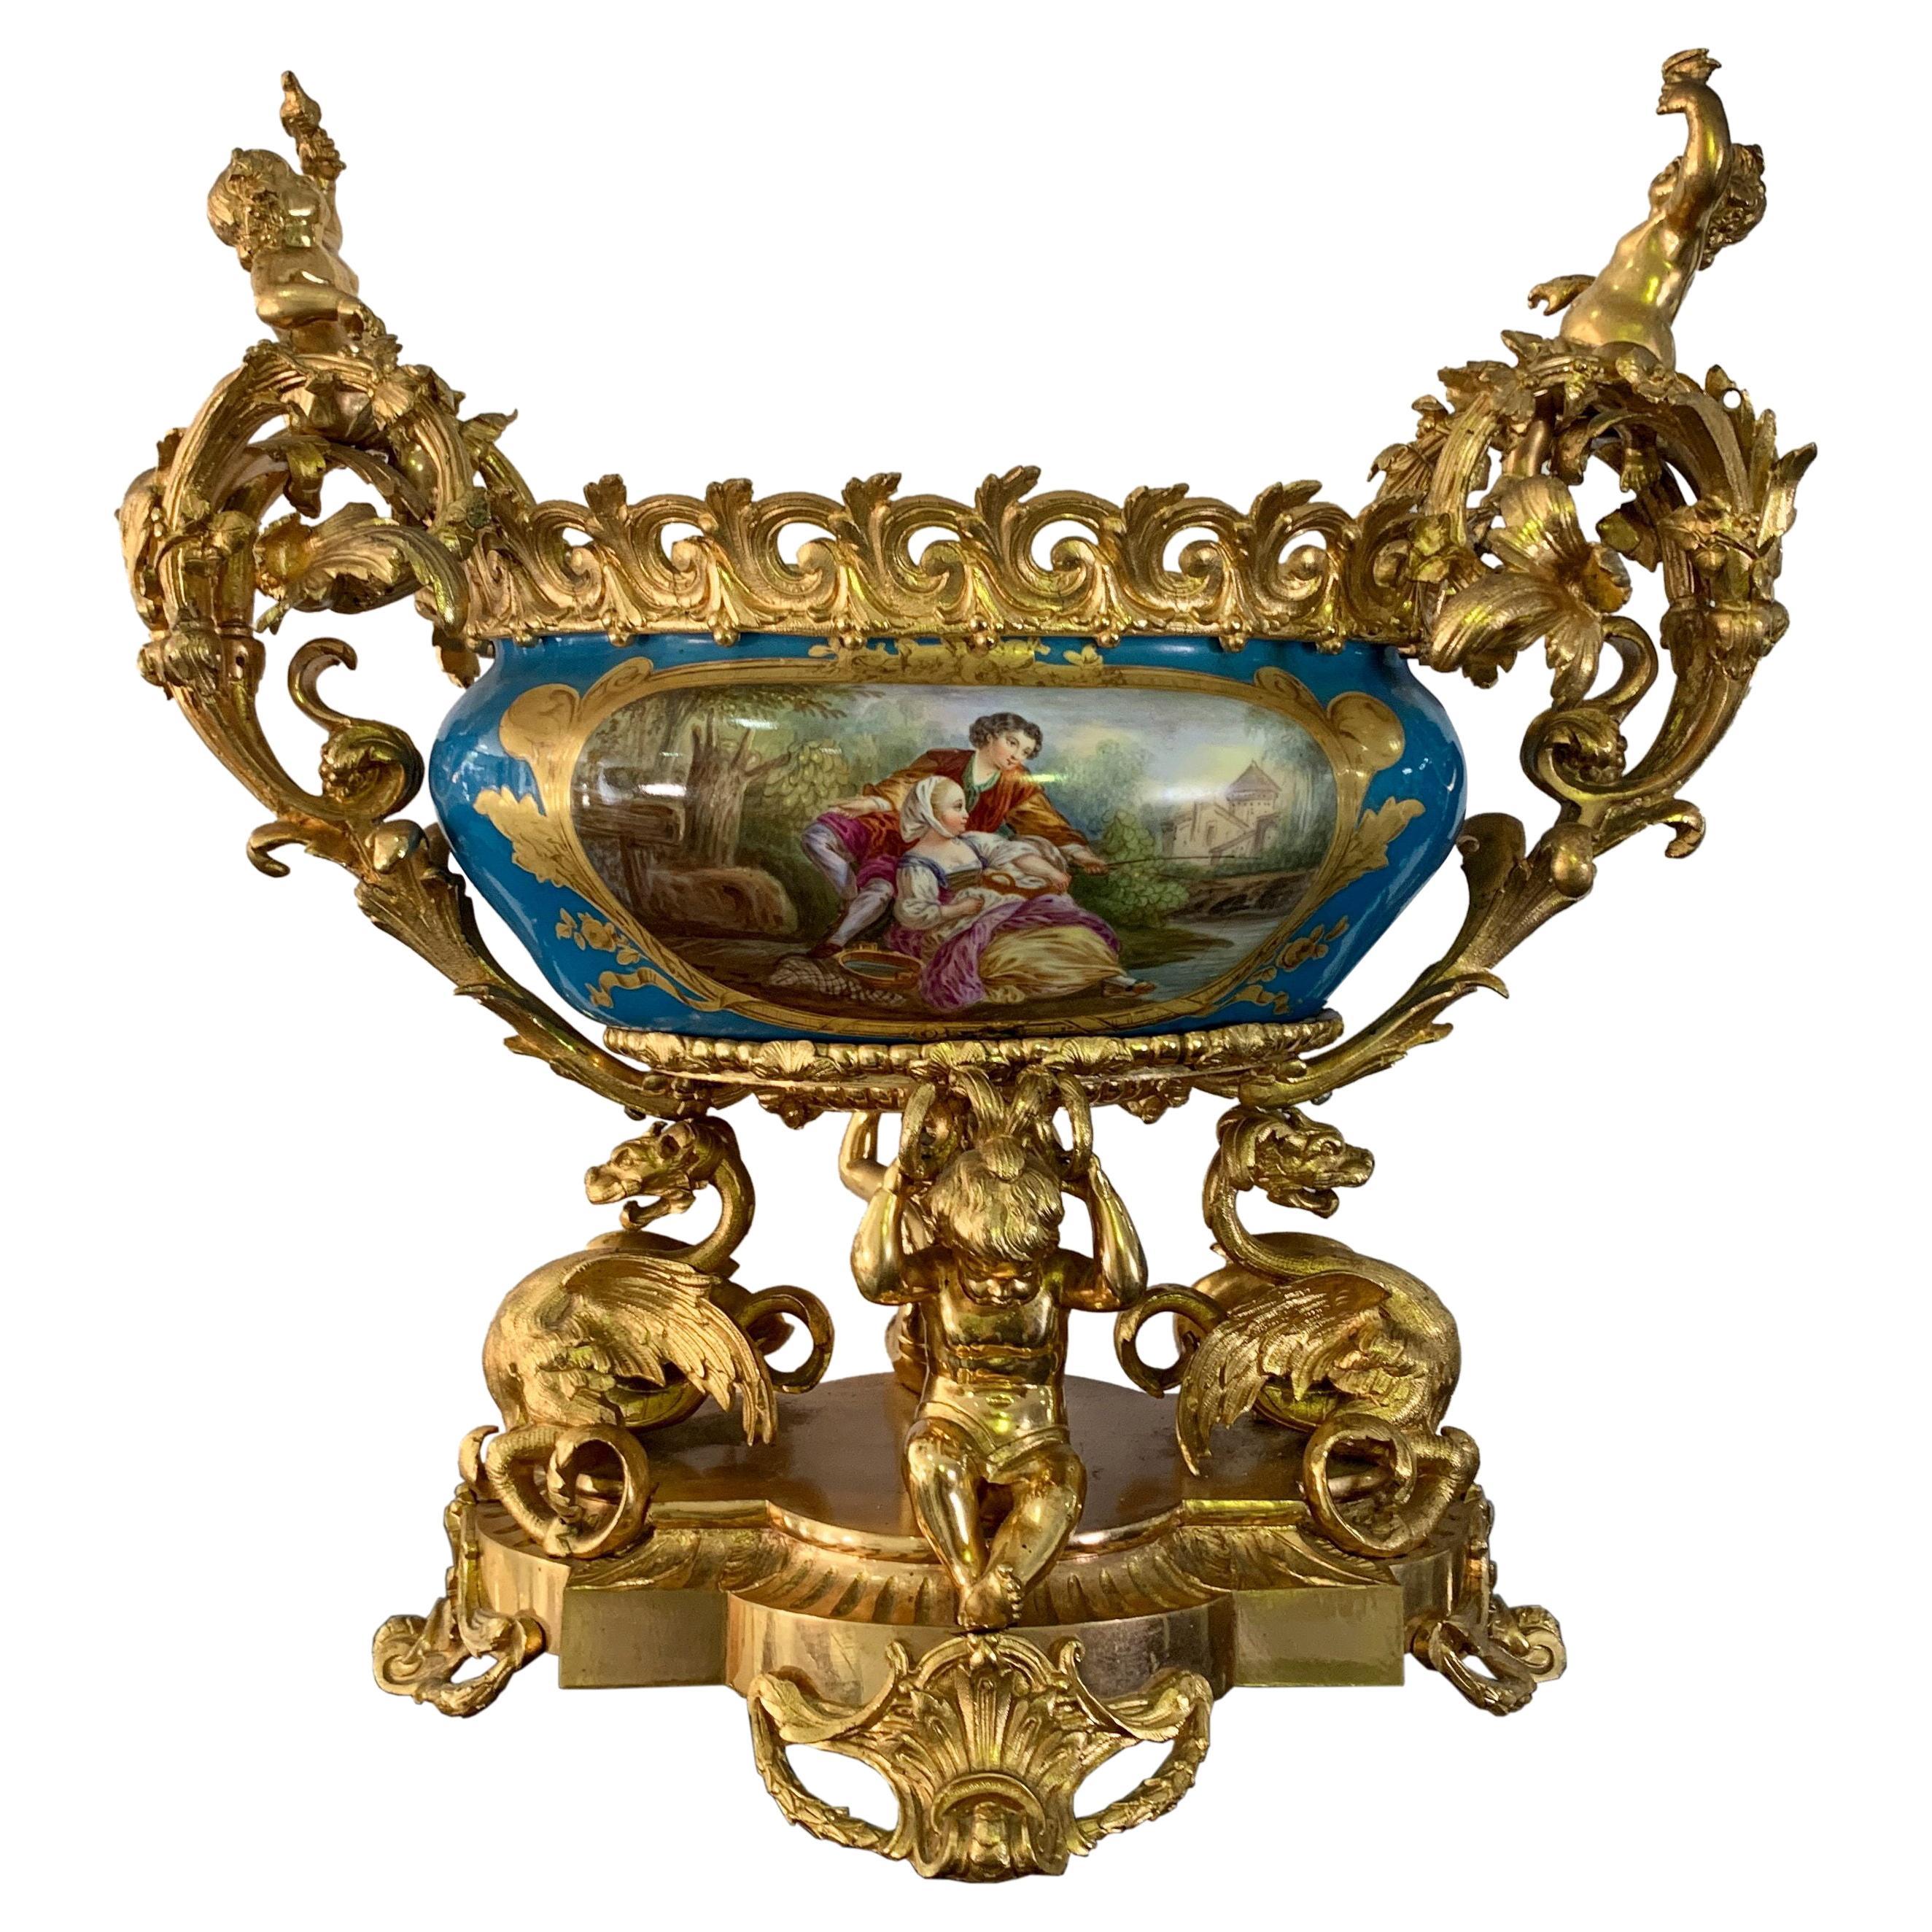 French Sevres Porcelain Gilt Bronze Mounted Centerpiece